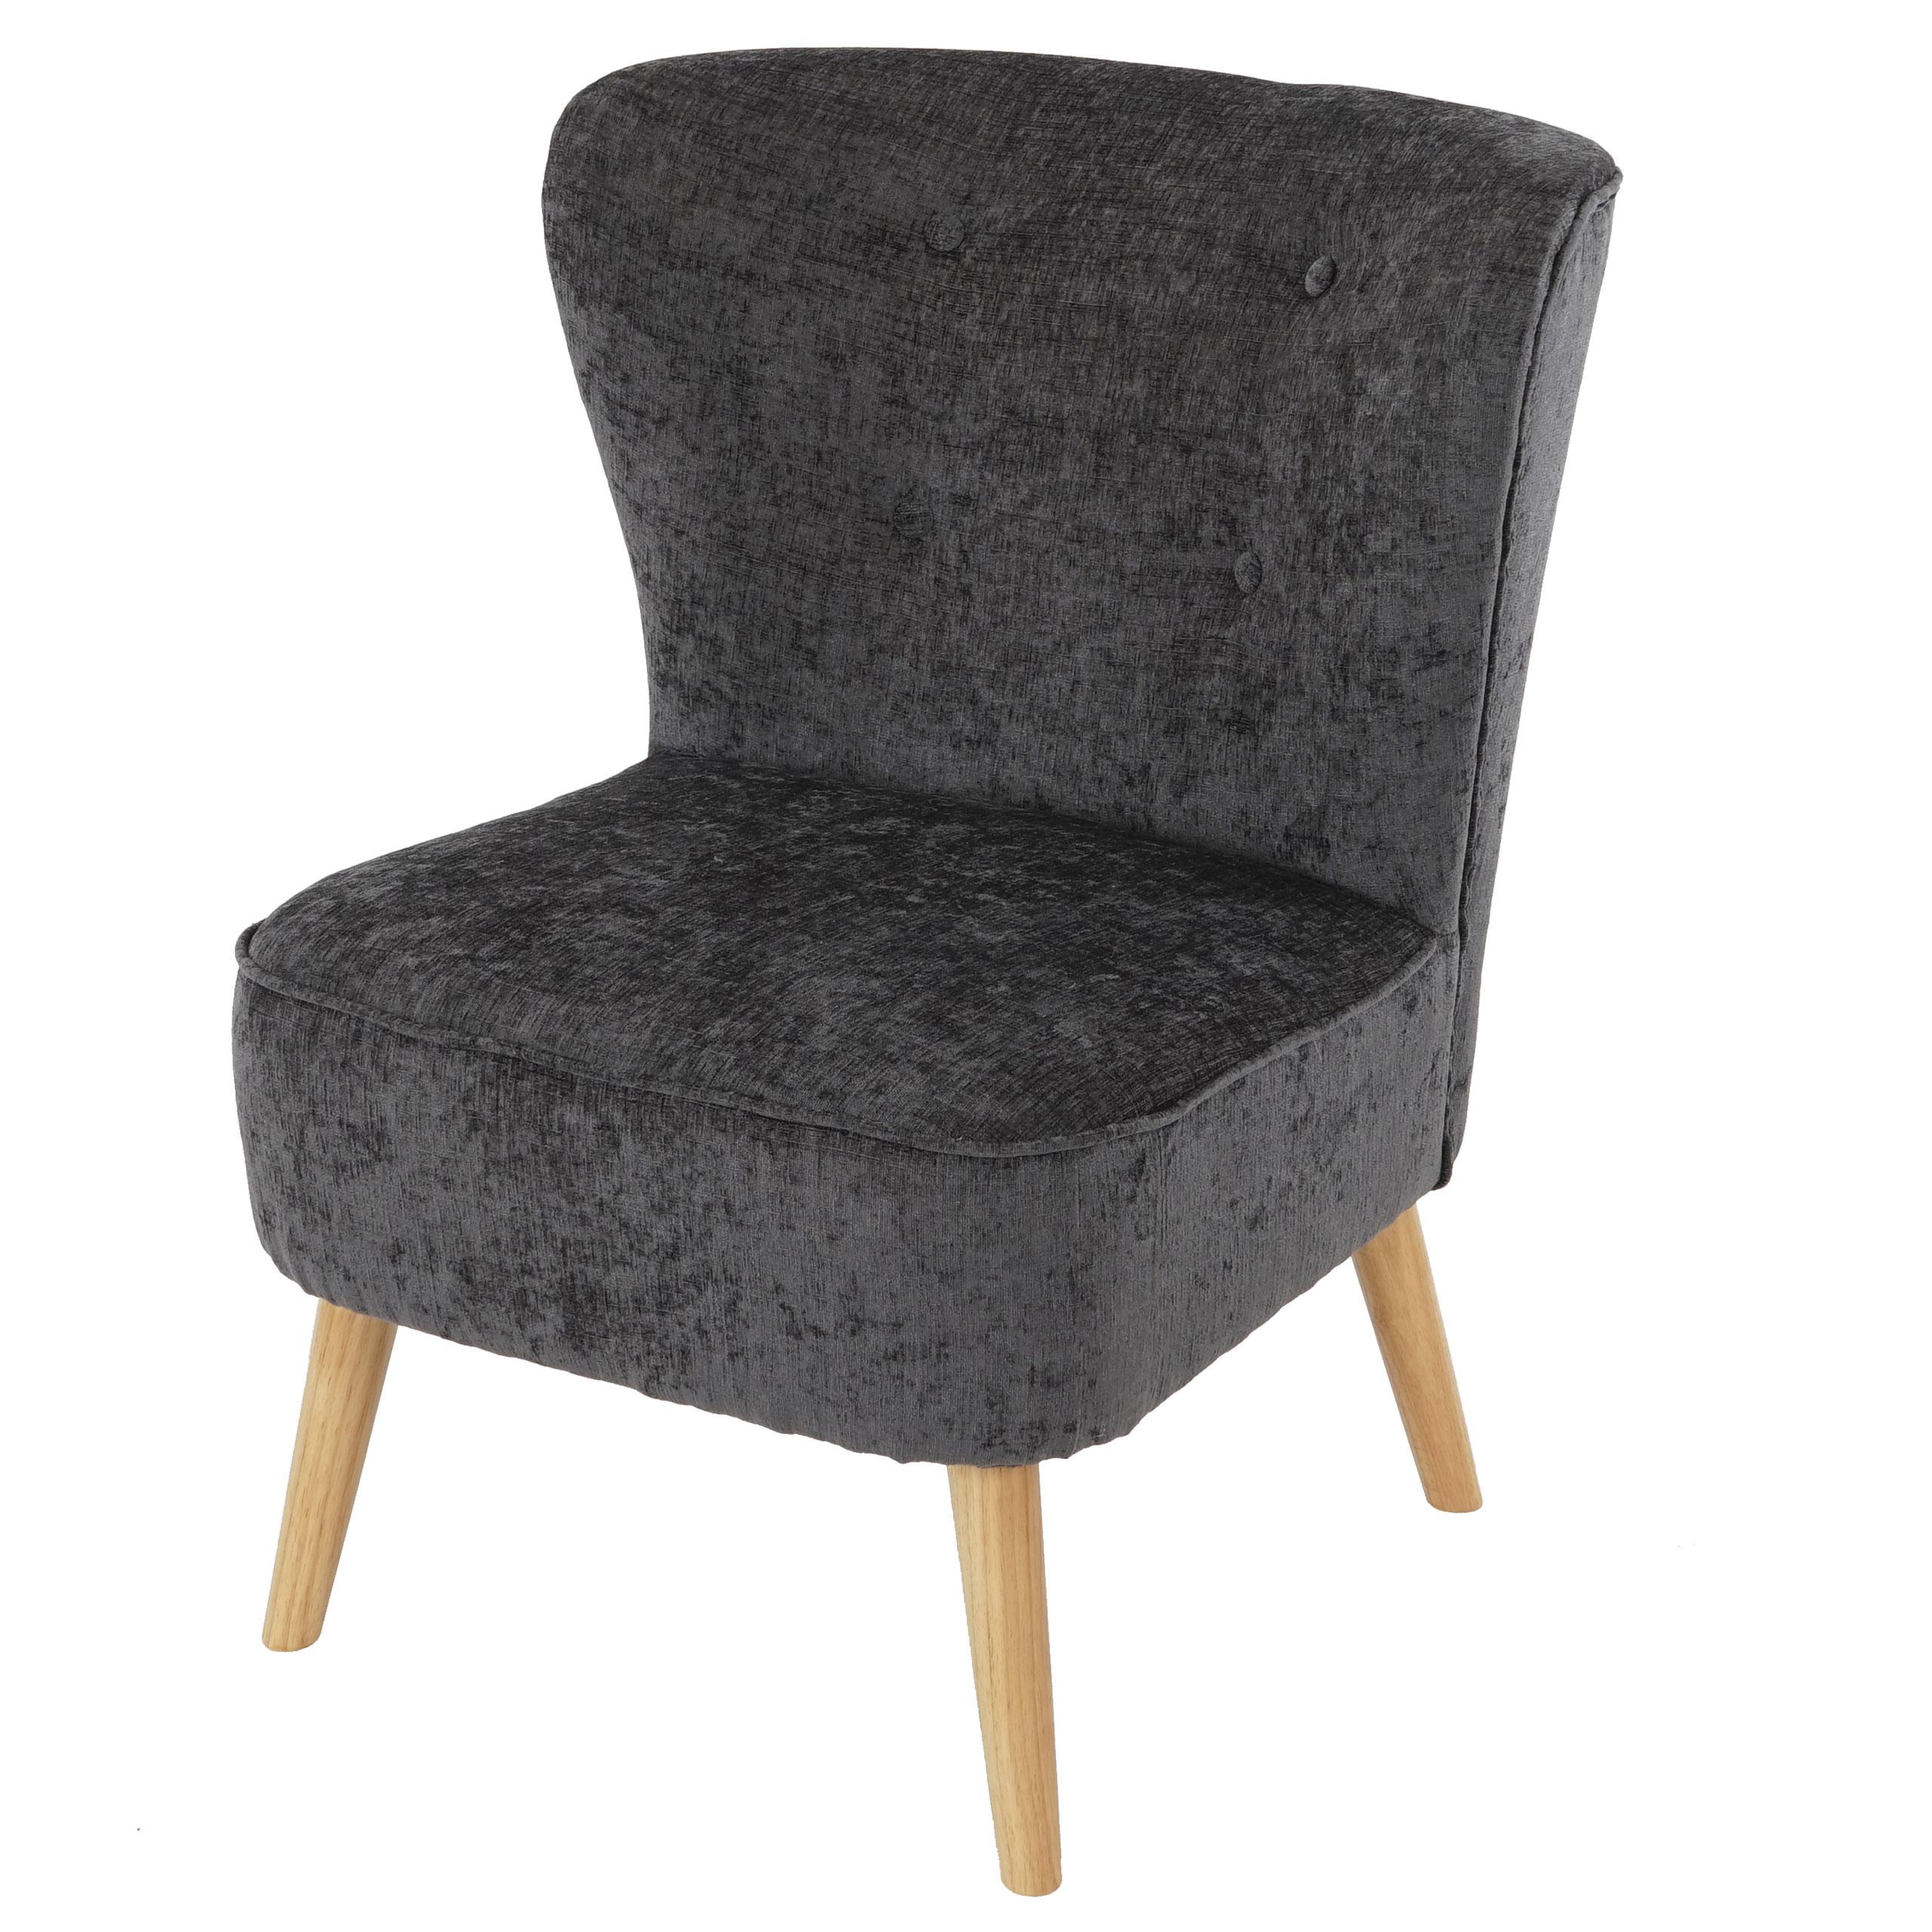 Sessel vaasa t313 loungesessel polstersessel grau textil for Polstersessel grau